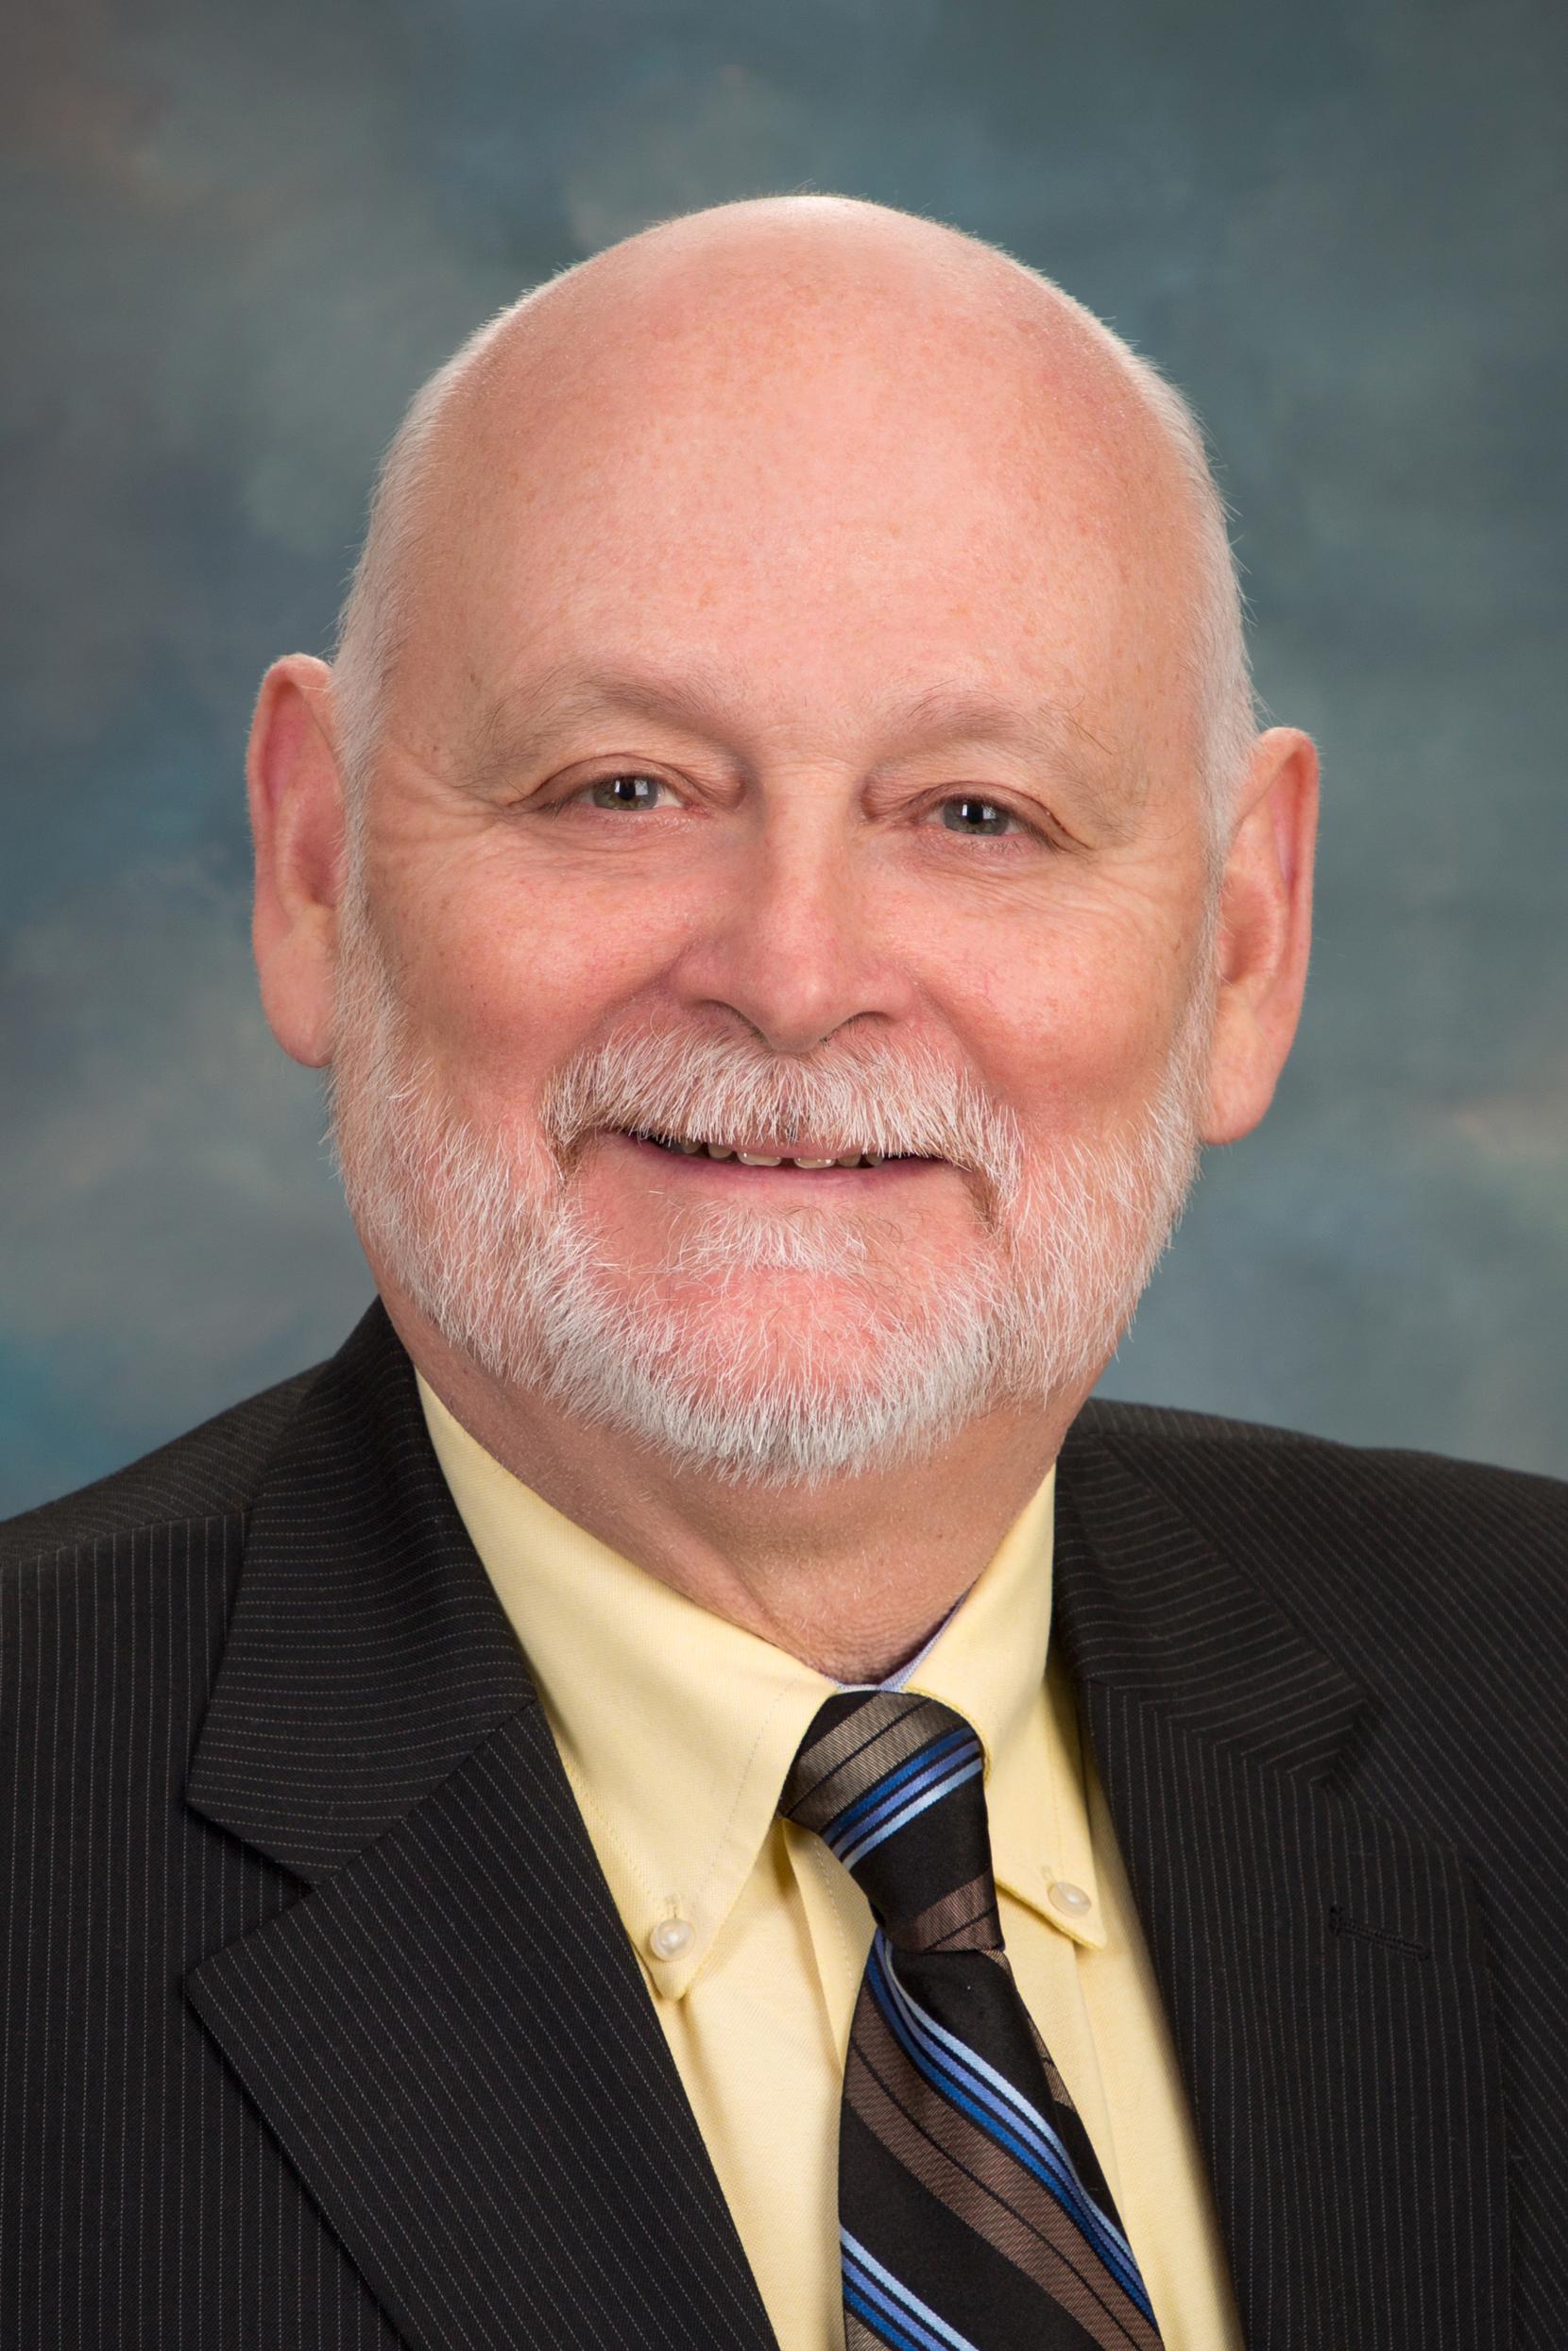 Larry Ingram  Senior Consultant  CHFM, CHSP, CHC, CHESP